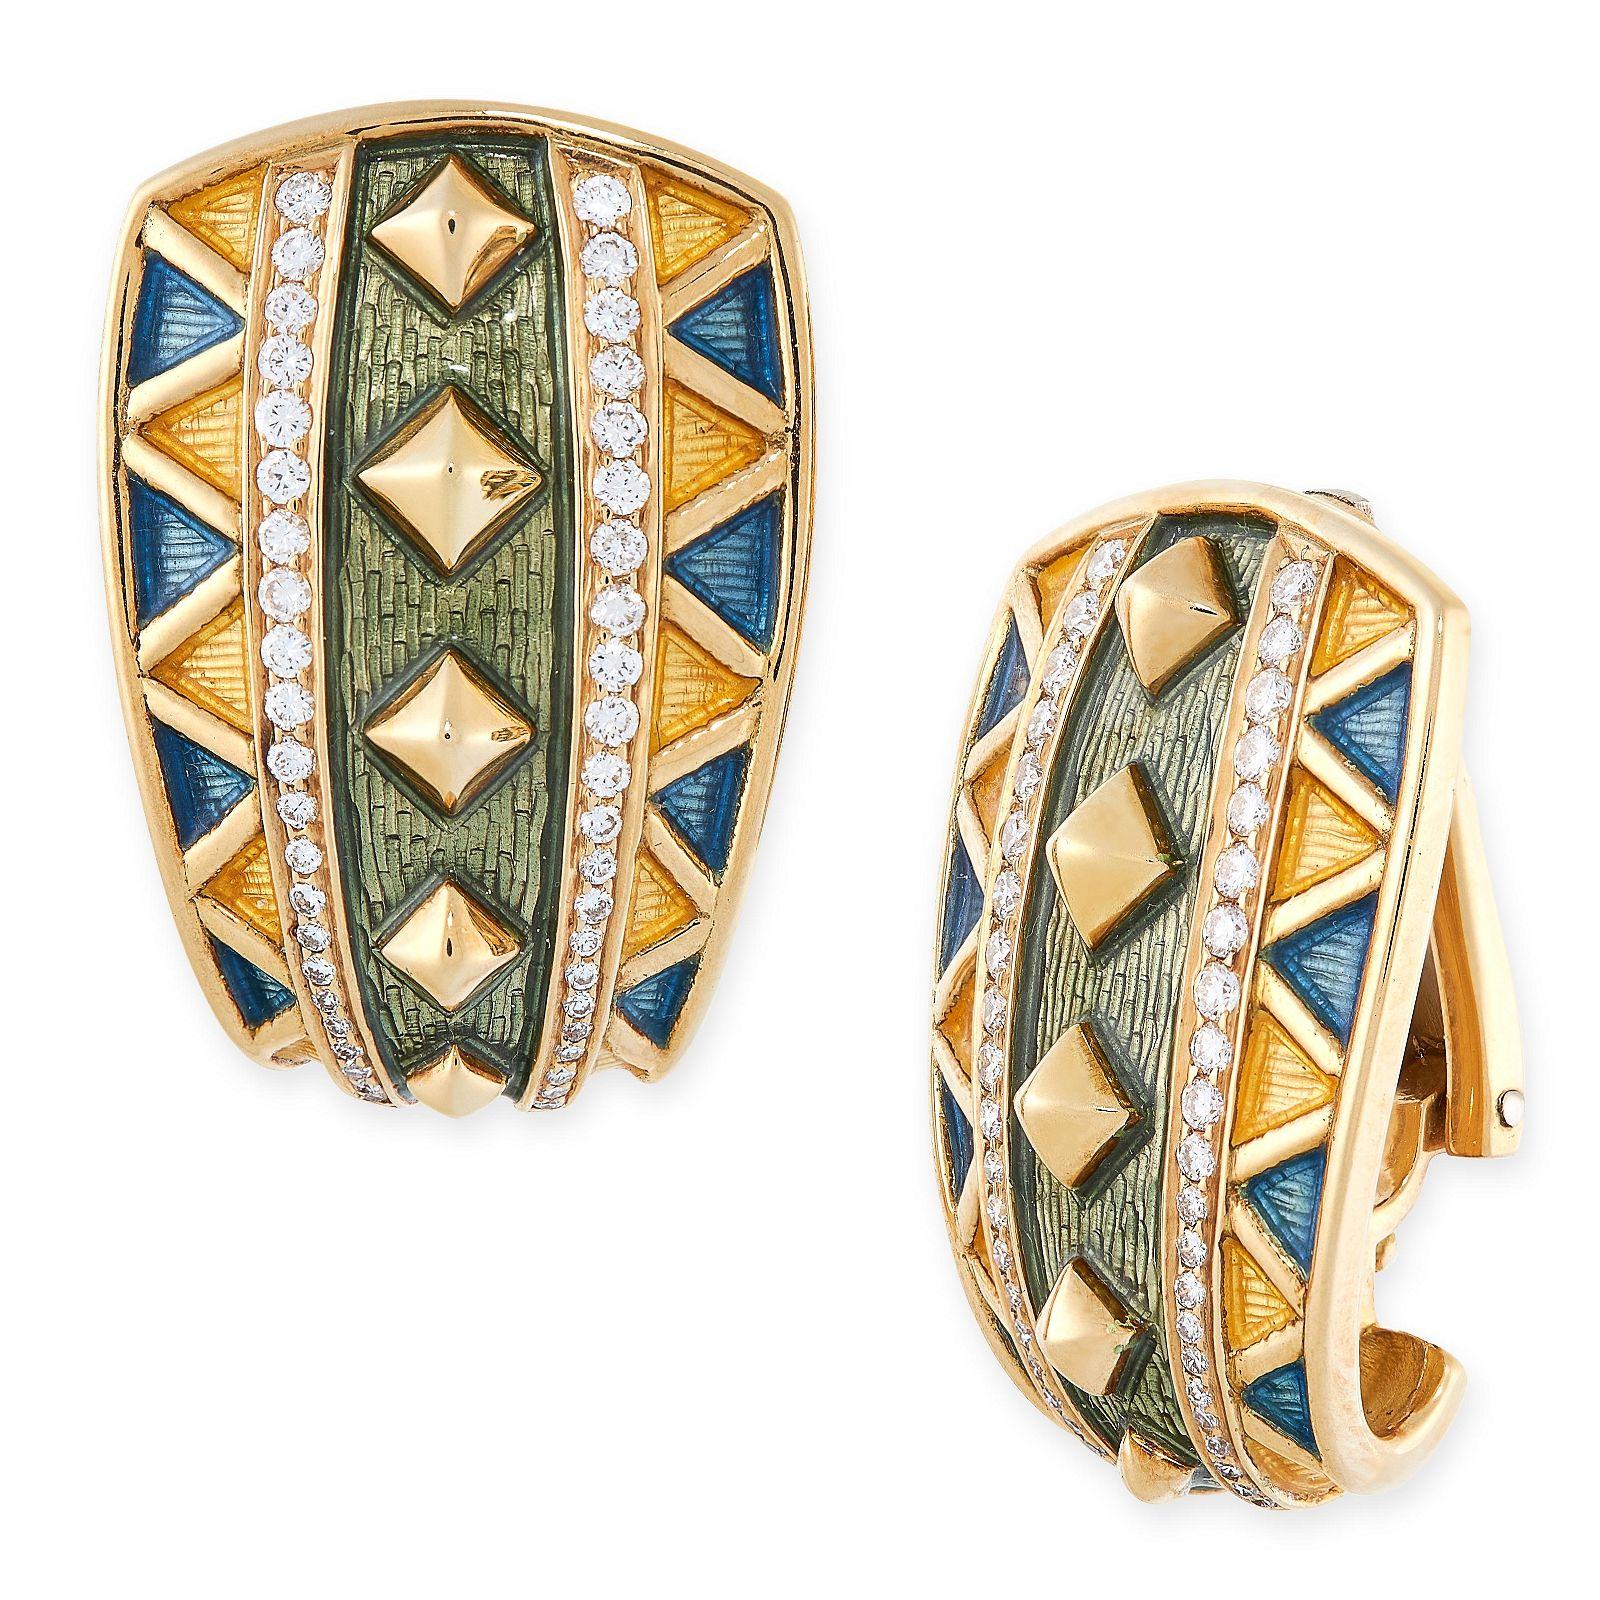 A PAIR OF ENAMEL AND DIAMOND CLIP EARRINGS, LEO DE